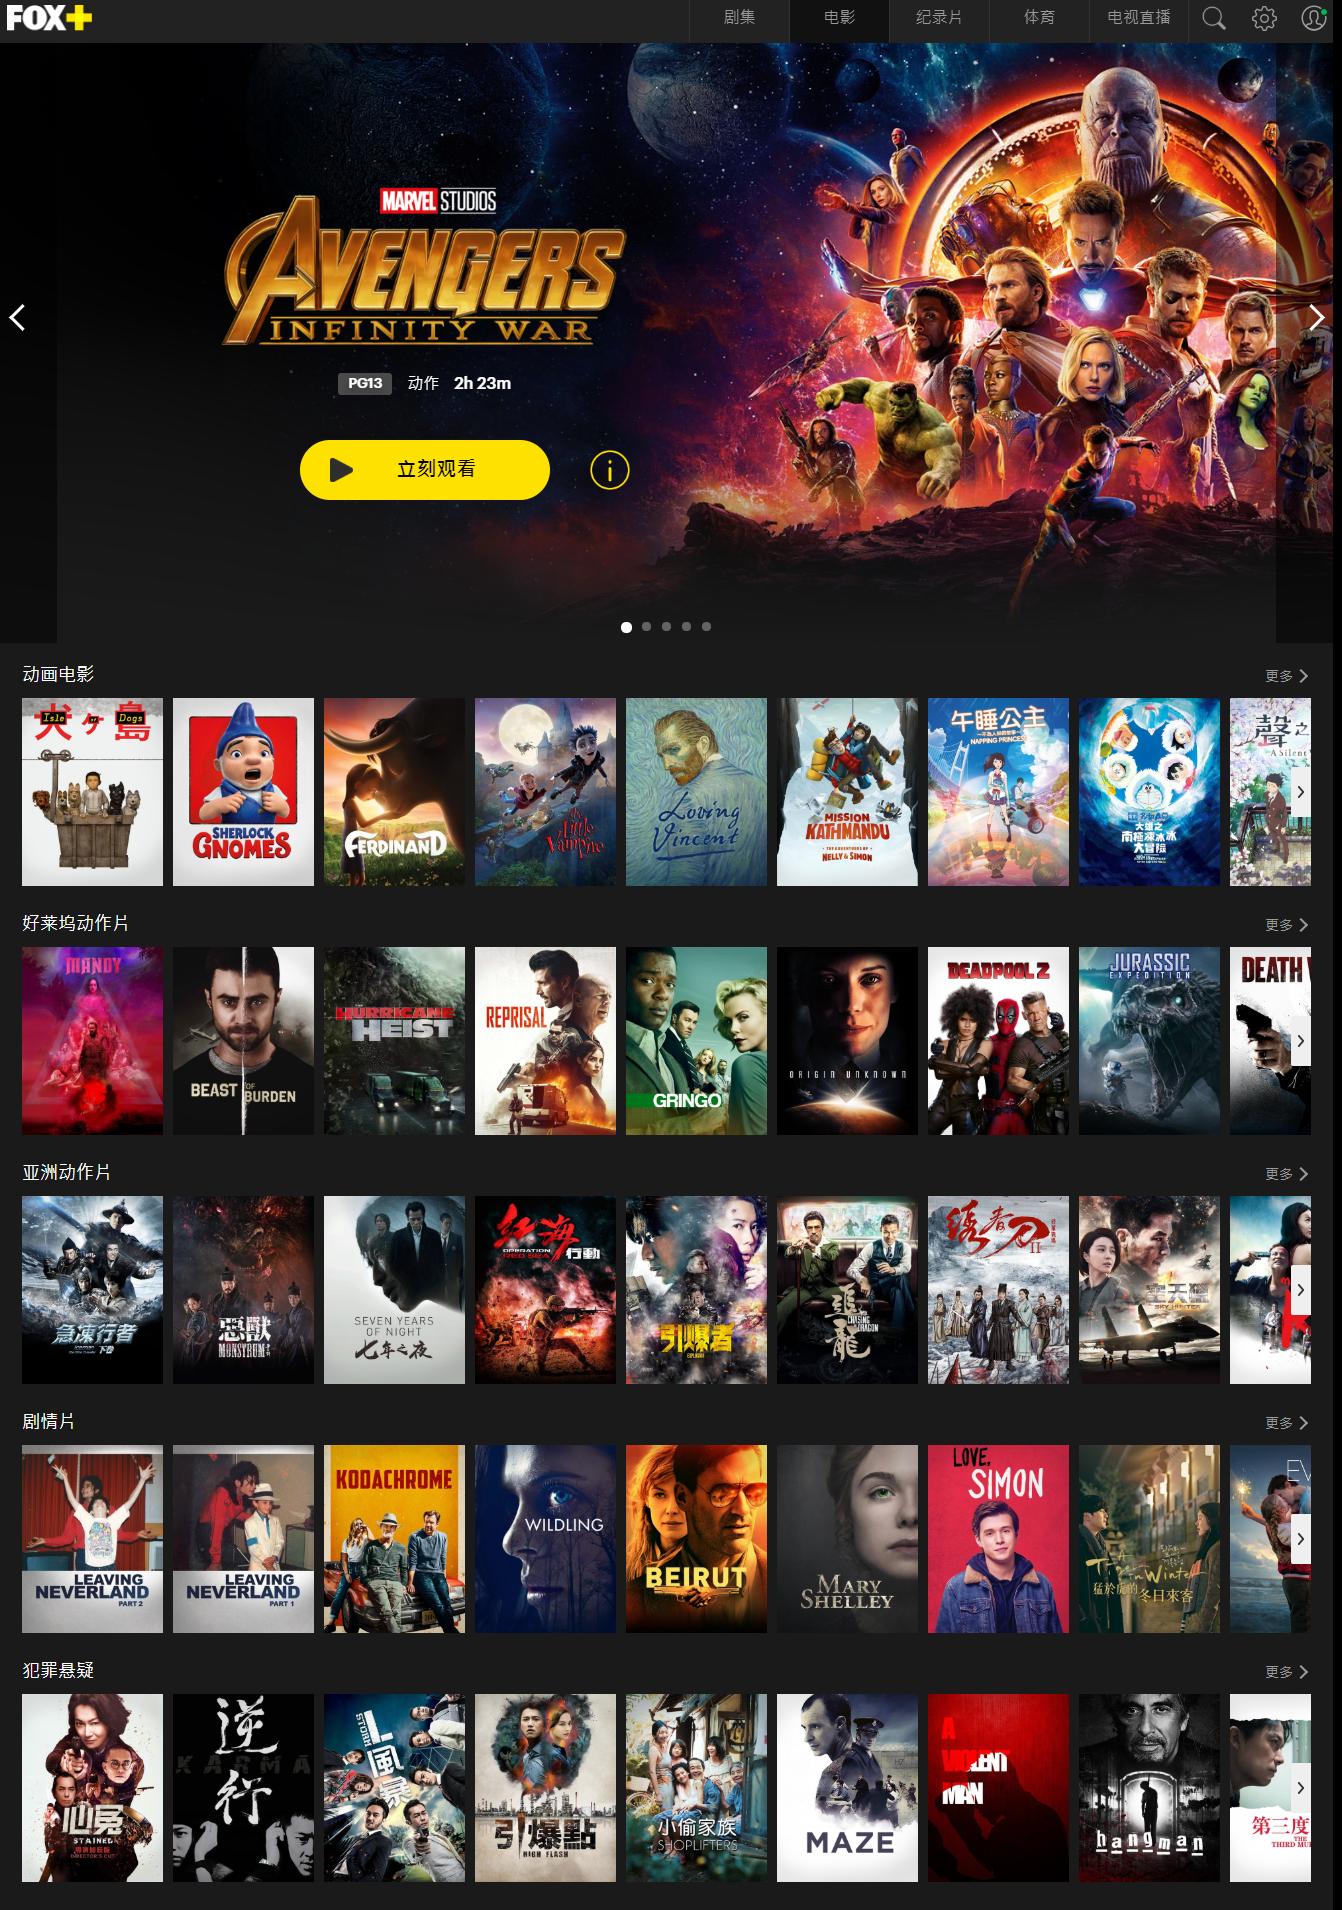 Movies_FOX+_sg.png